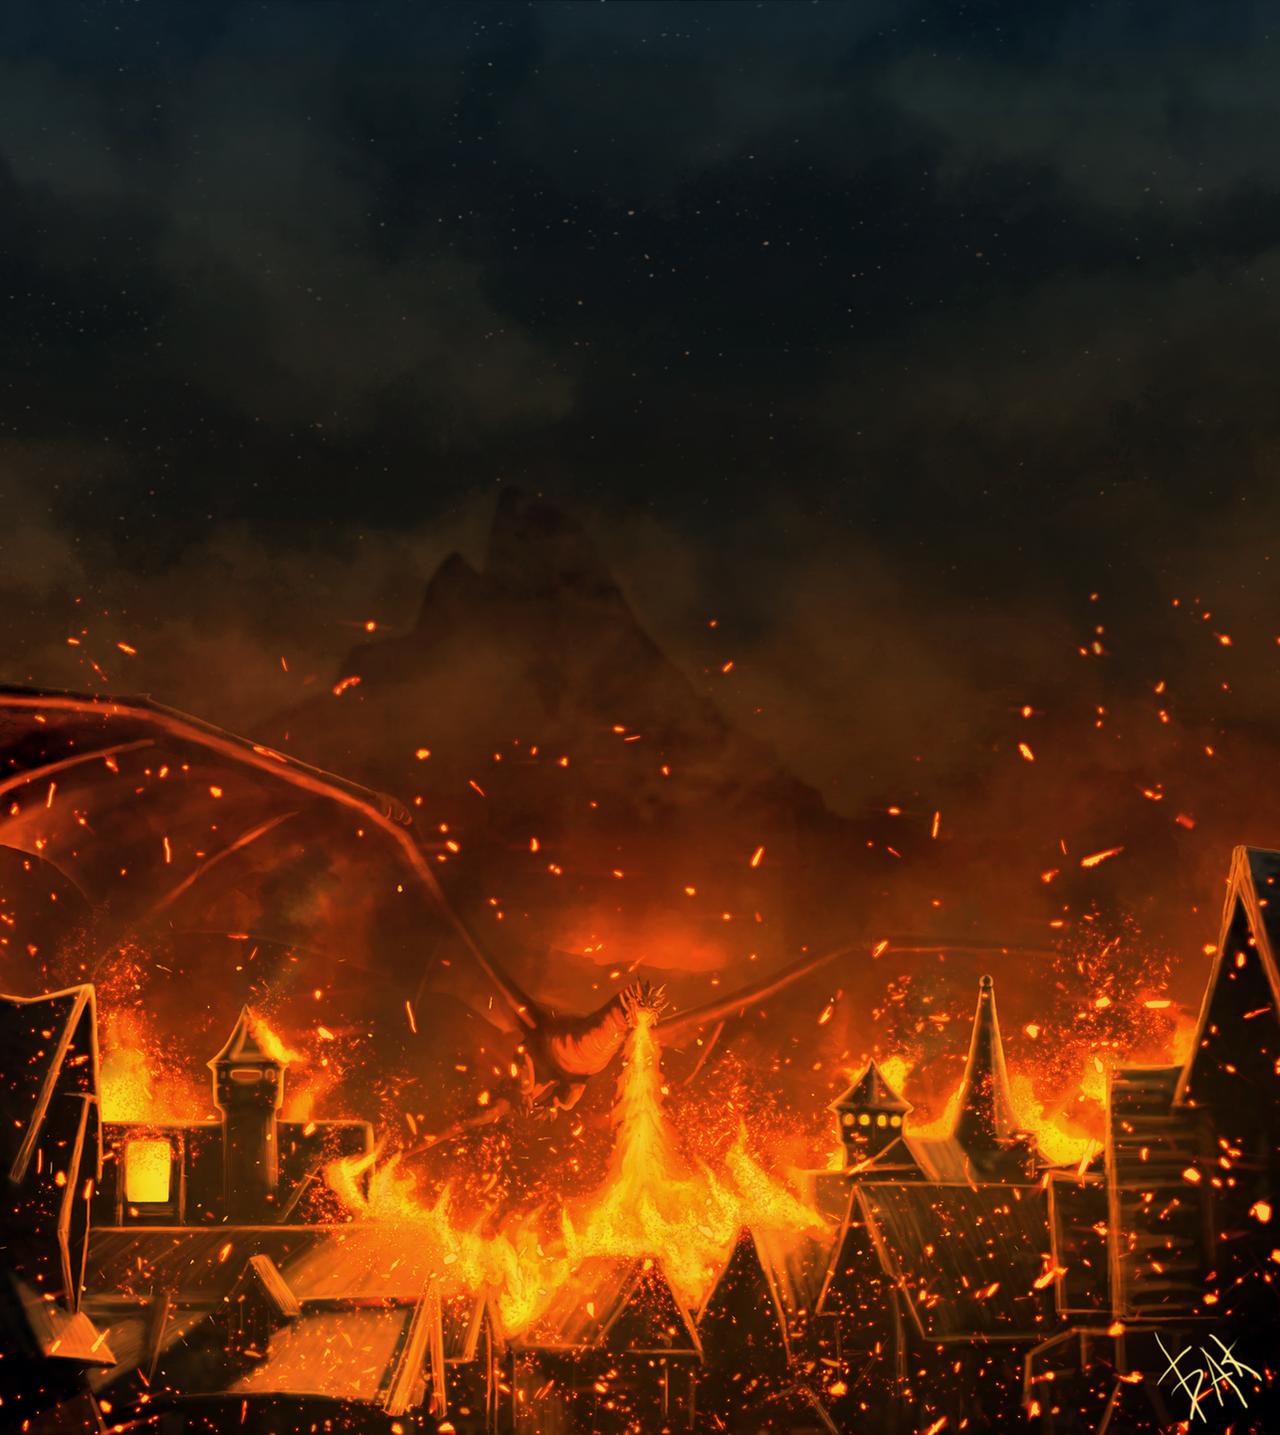 I am fire! I am... DEATH! by AlyxSP